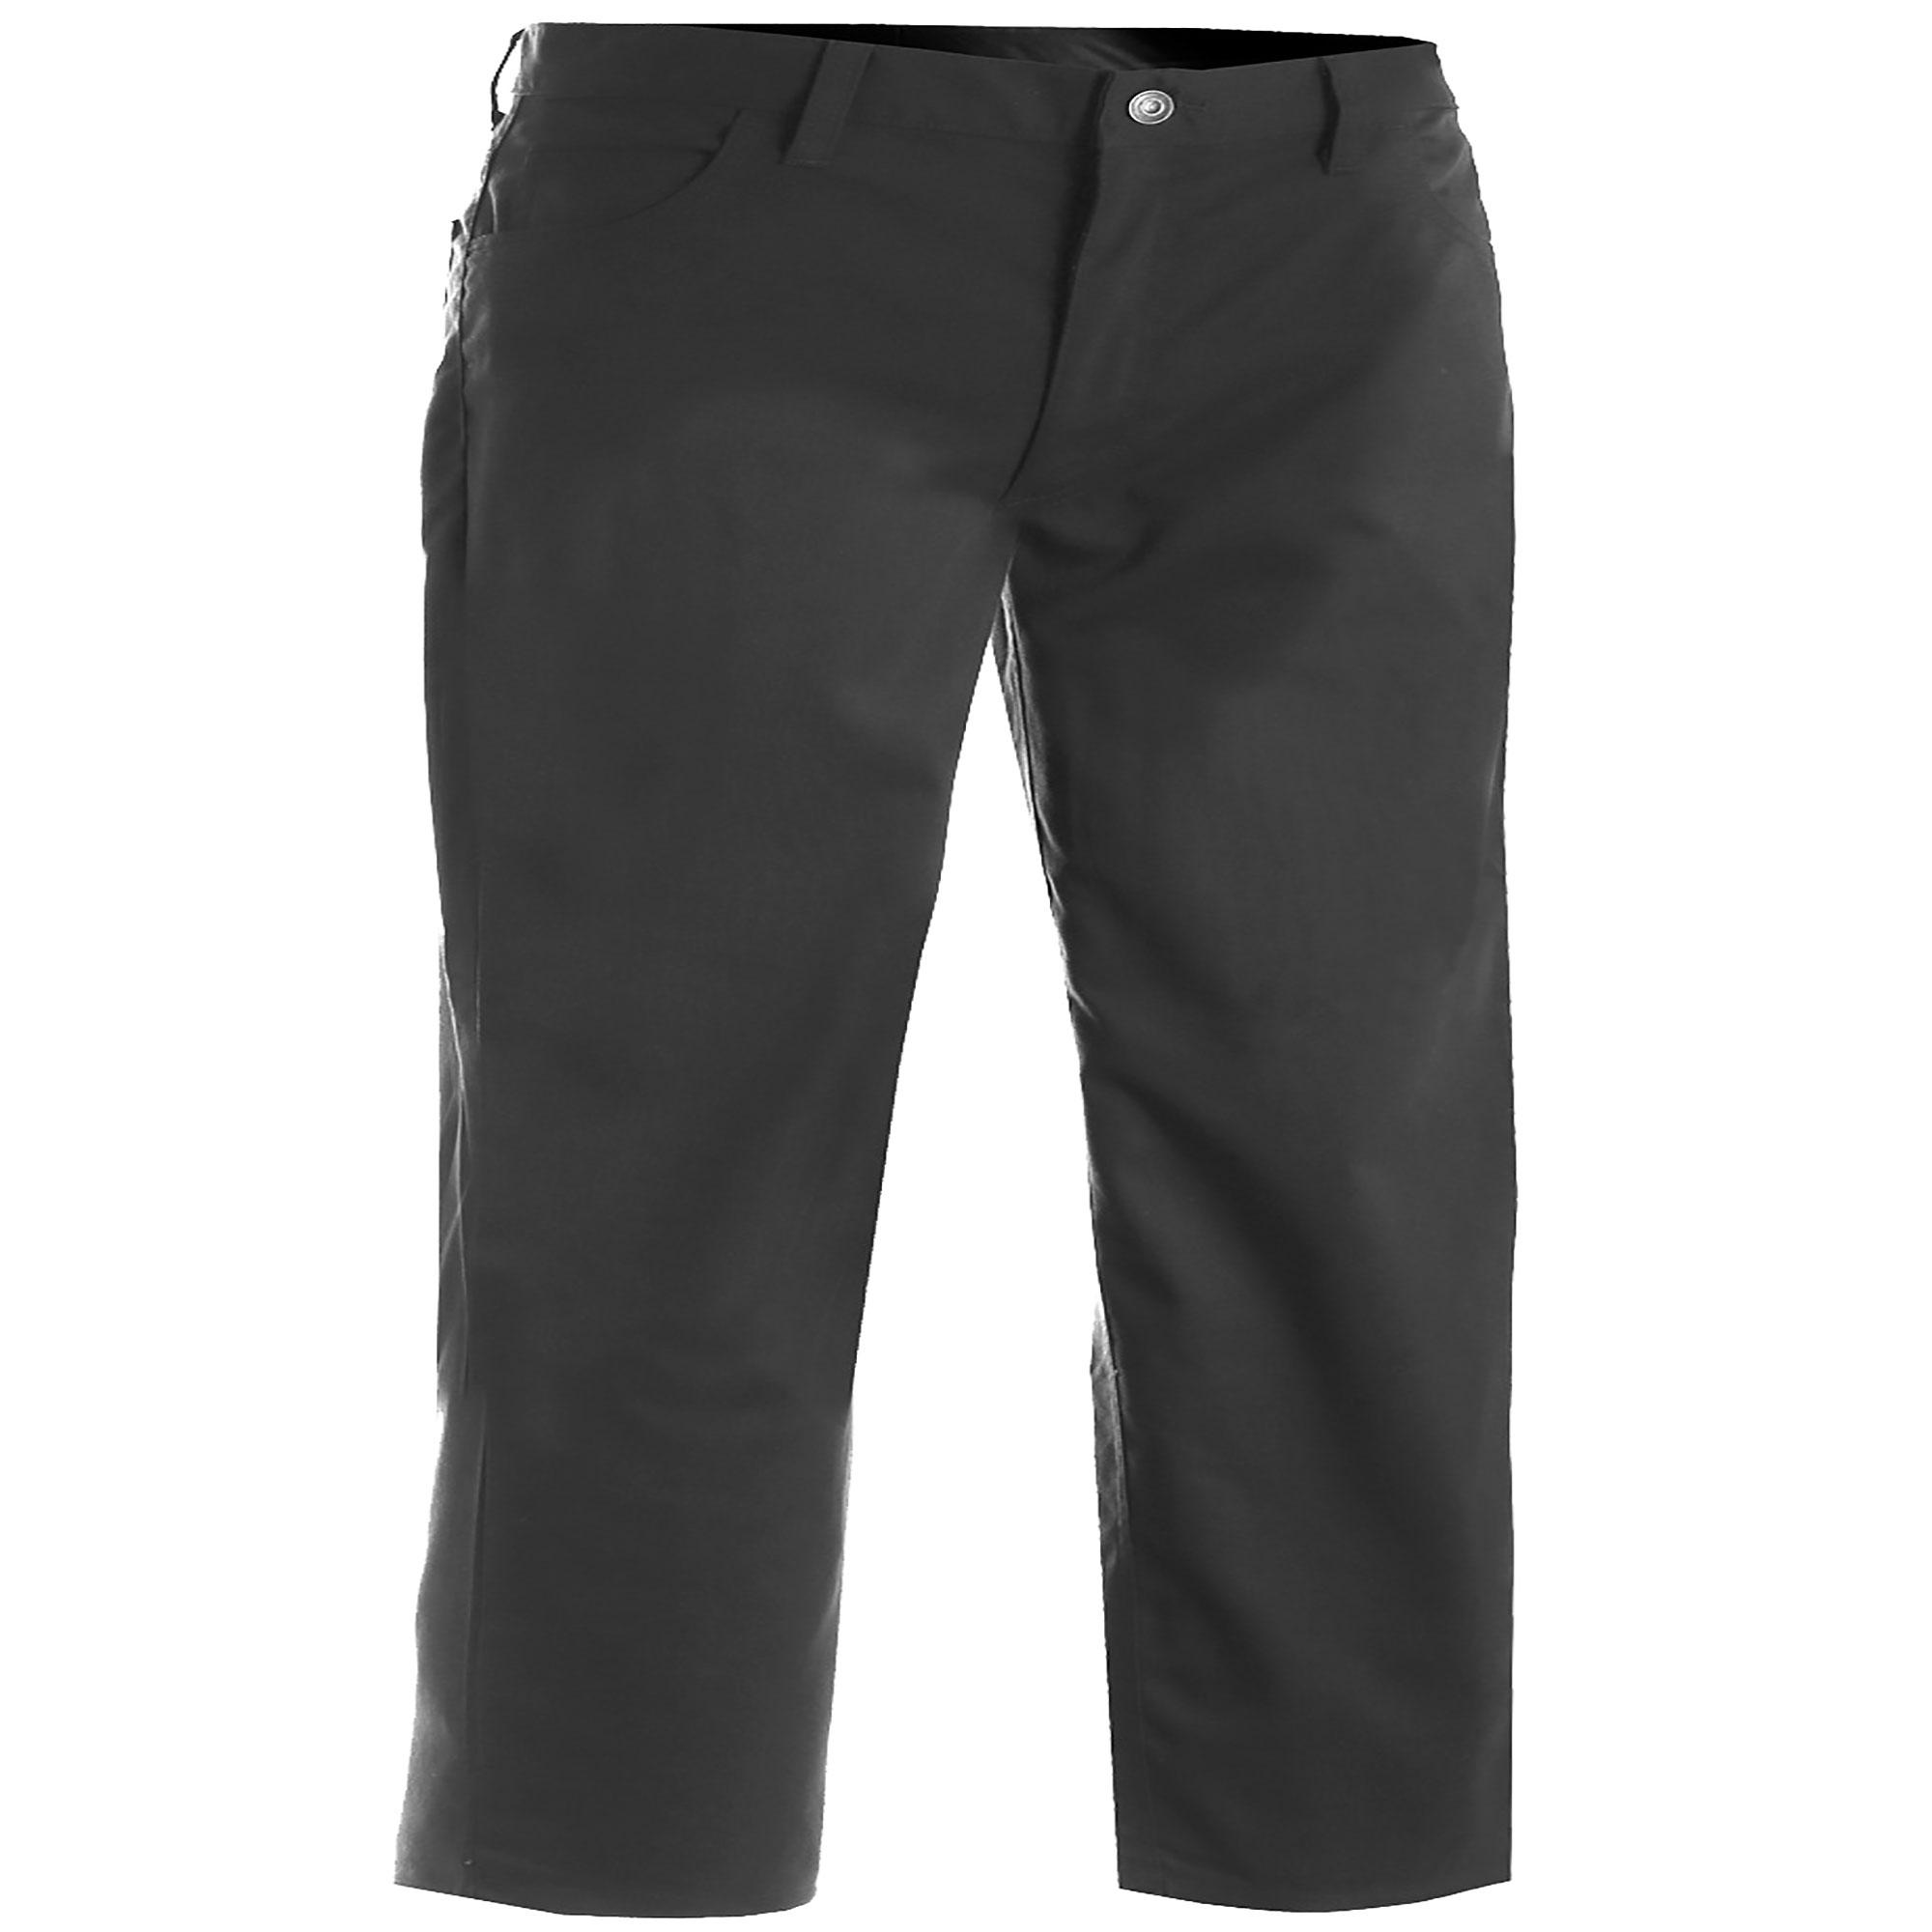 Edwards Garment Men's Stretch Zipper Pocket Pant, Style 2551